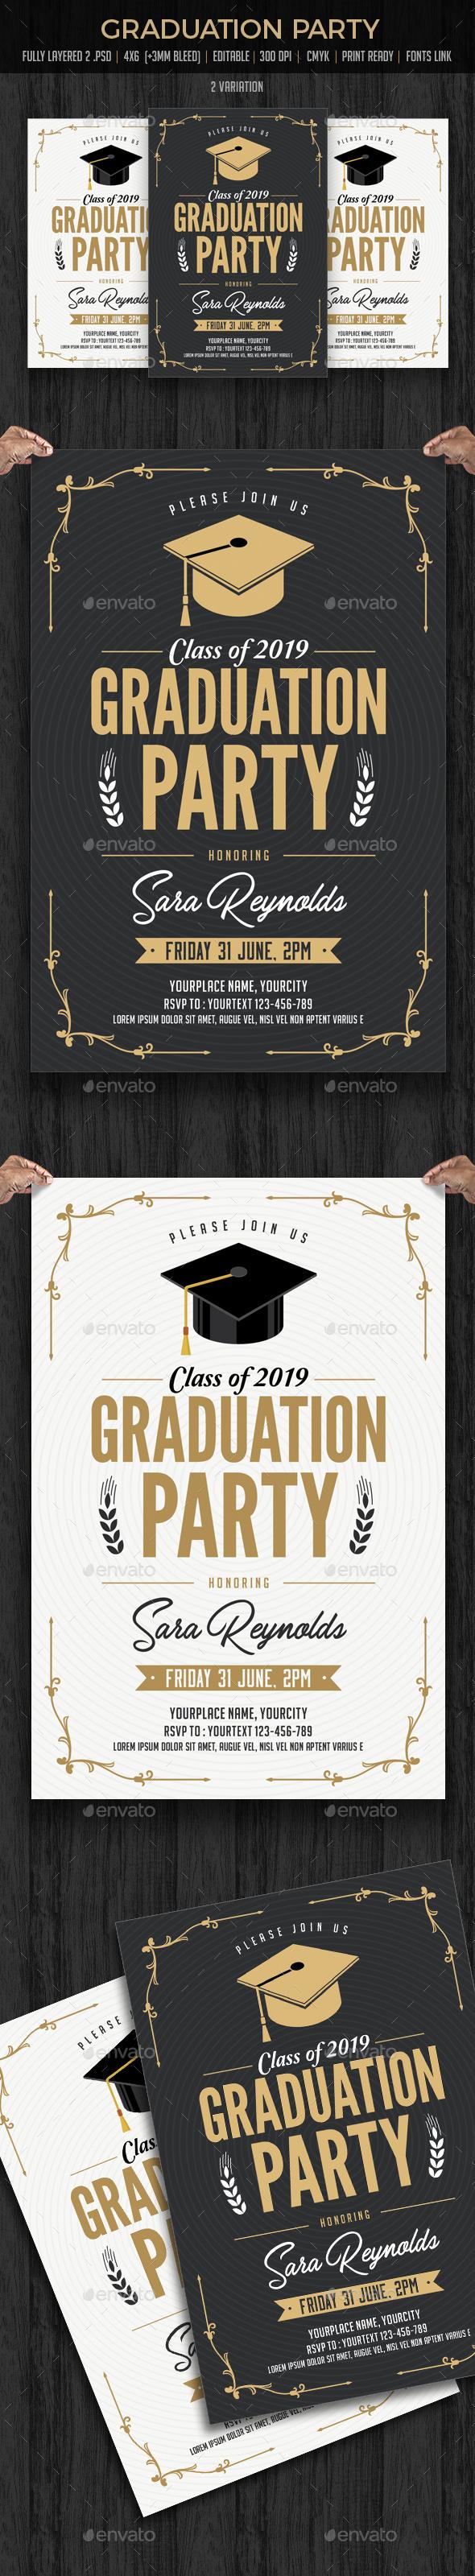 Graduation Invitation - Cards & Invites Print Templates